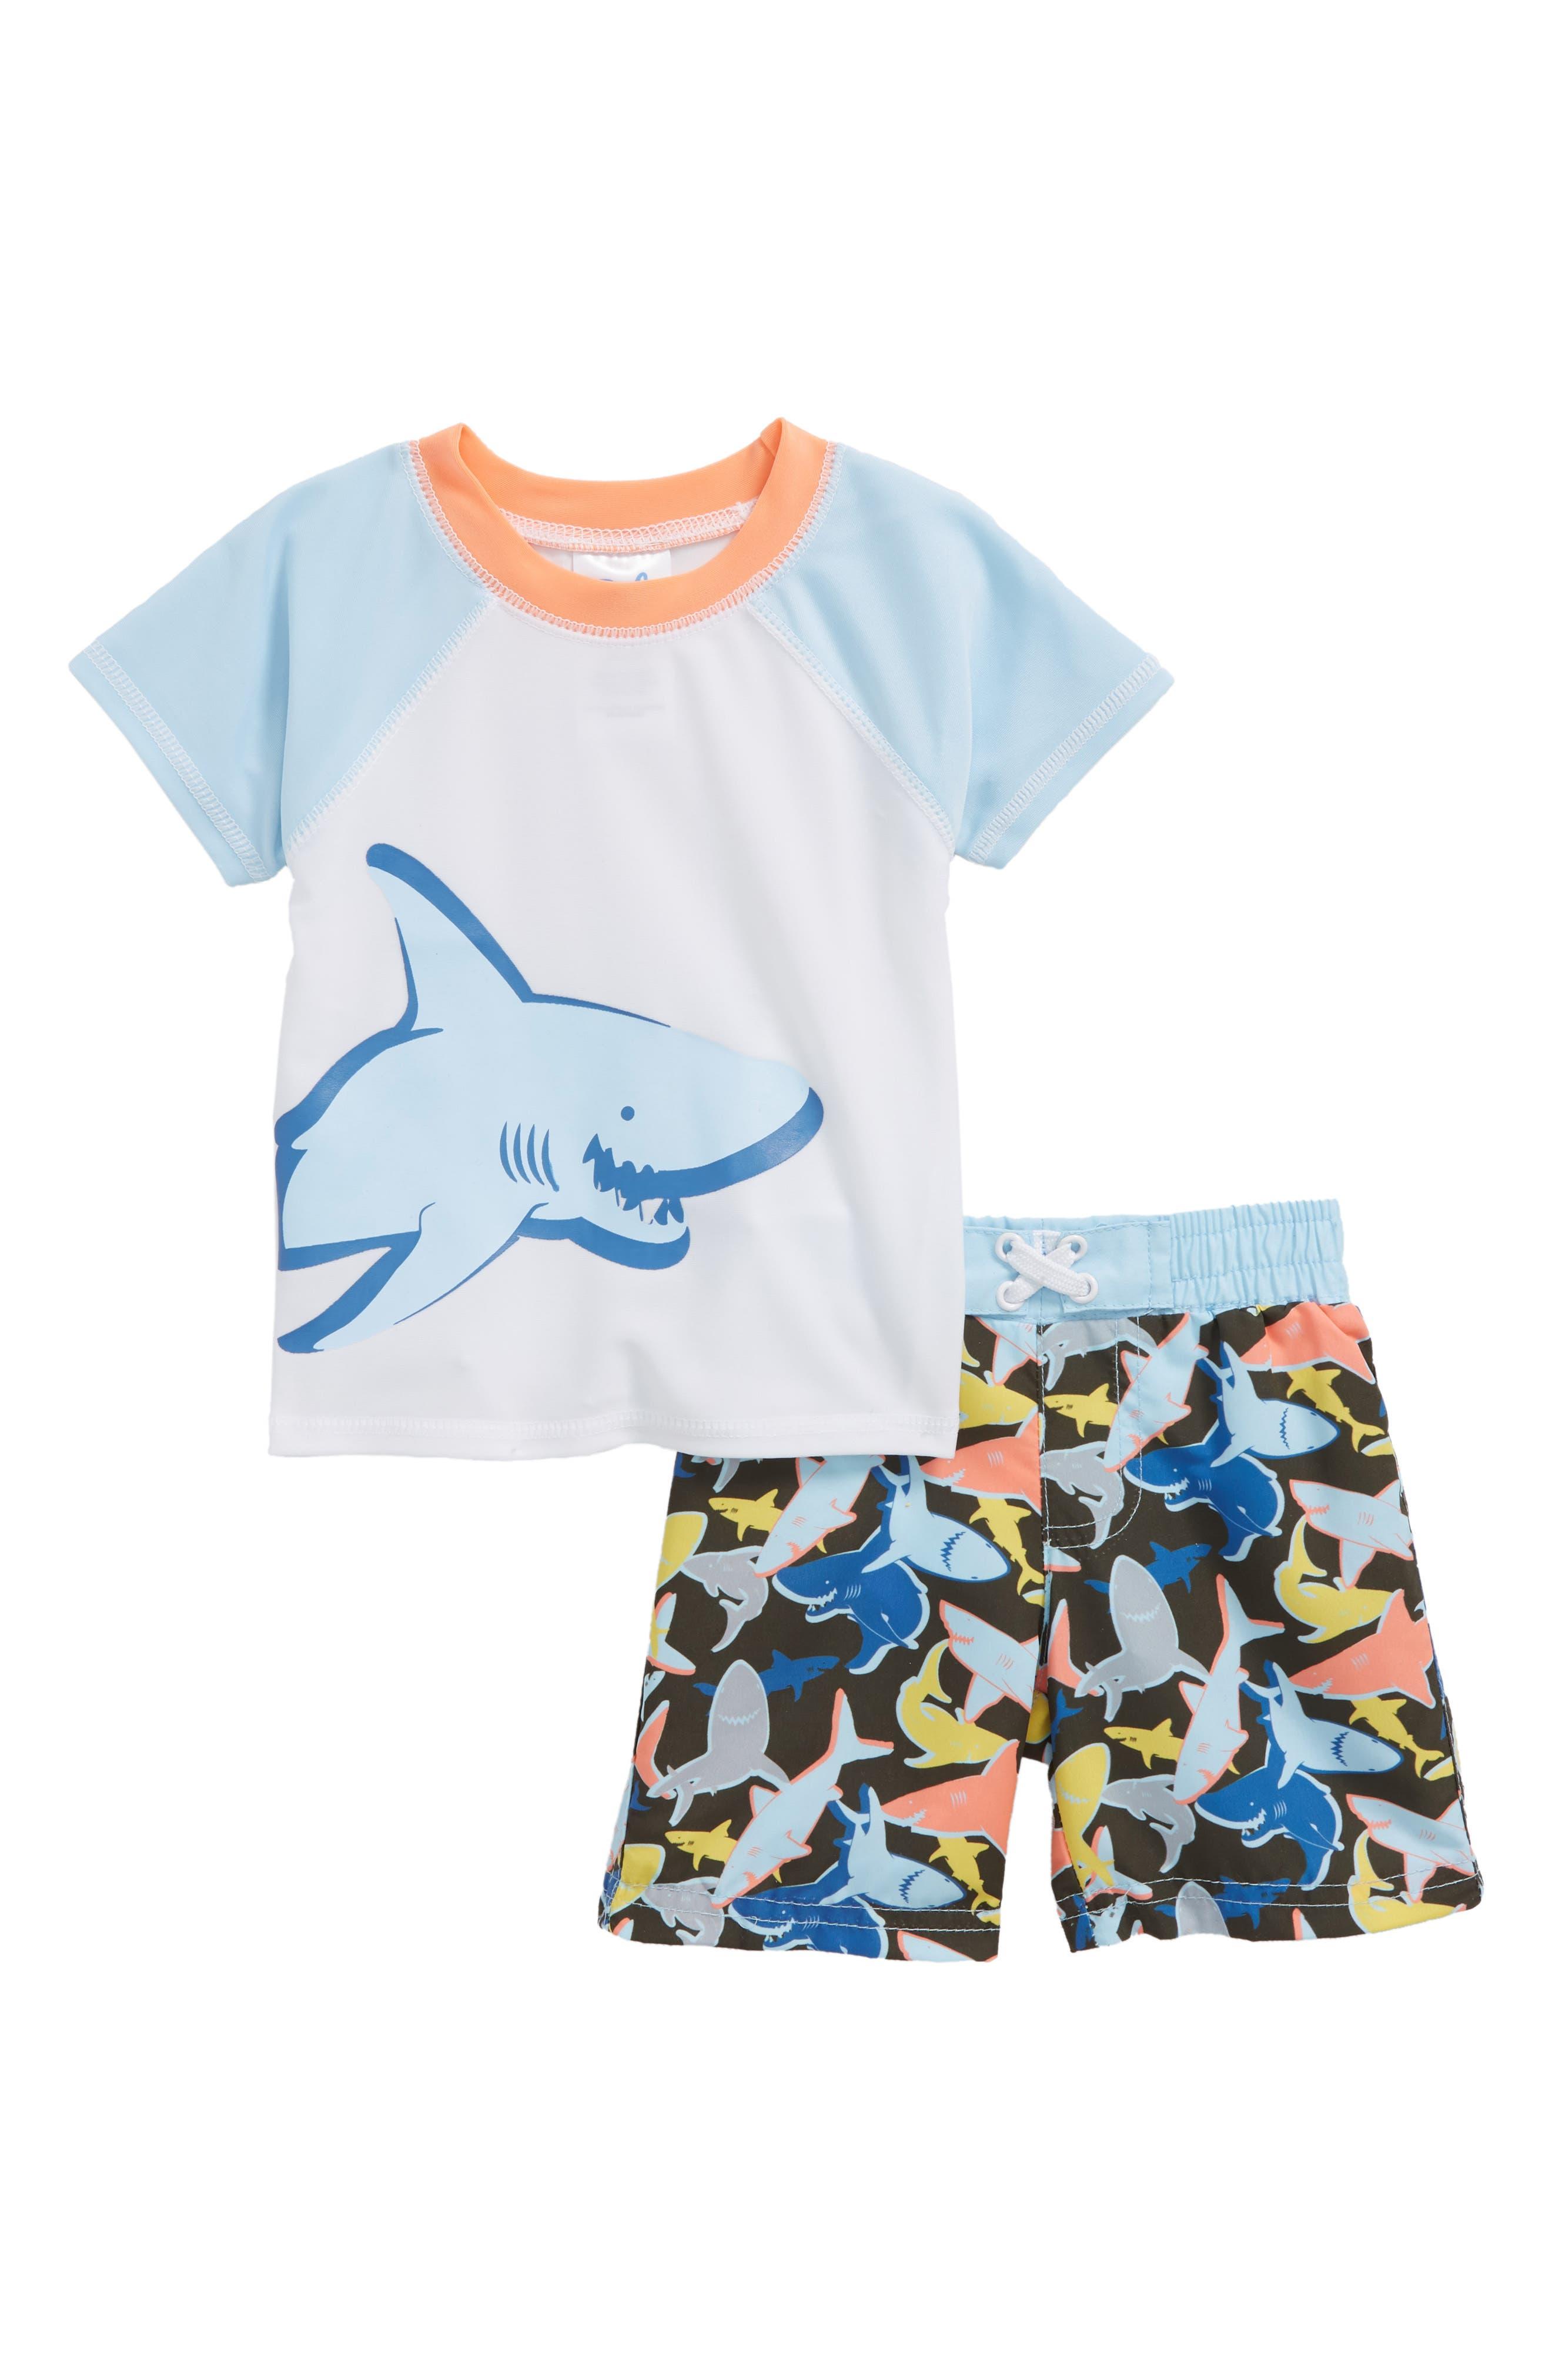 Friendly Shark Collison Two-Piece Rashguard Swimsuit,                             Main thumbnail 1, color,                             White Multi